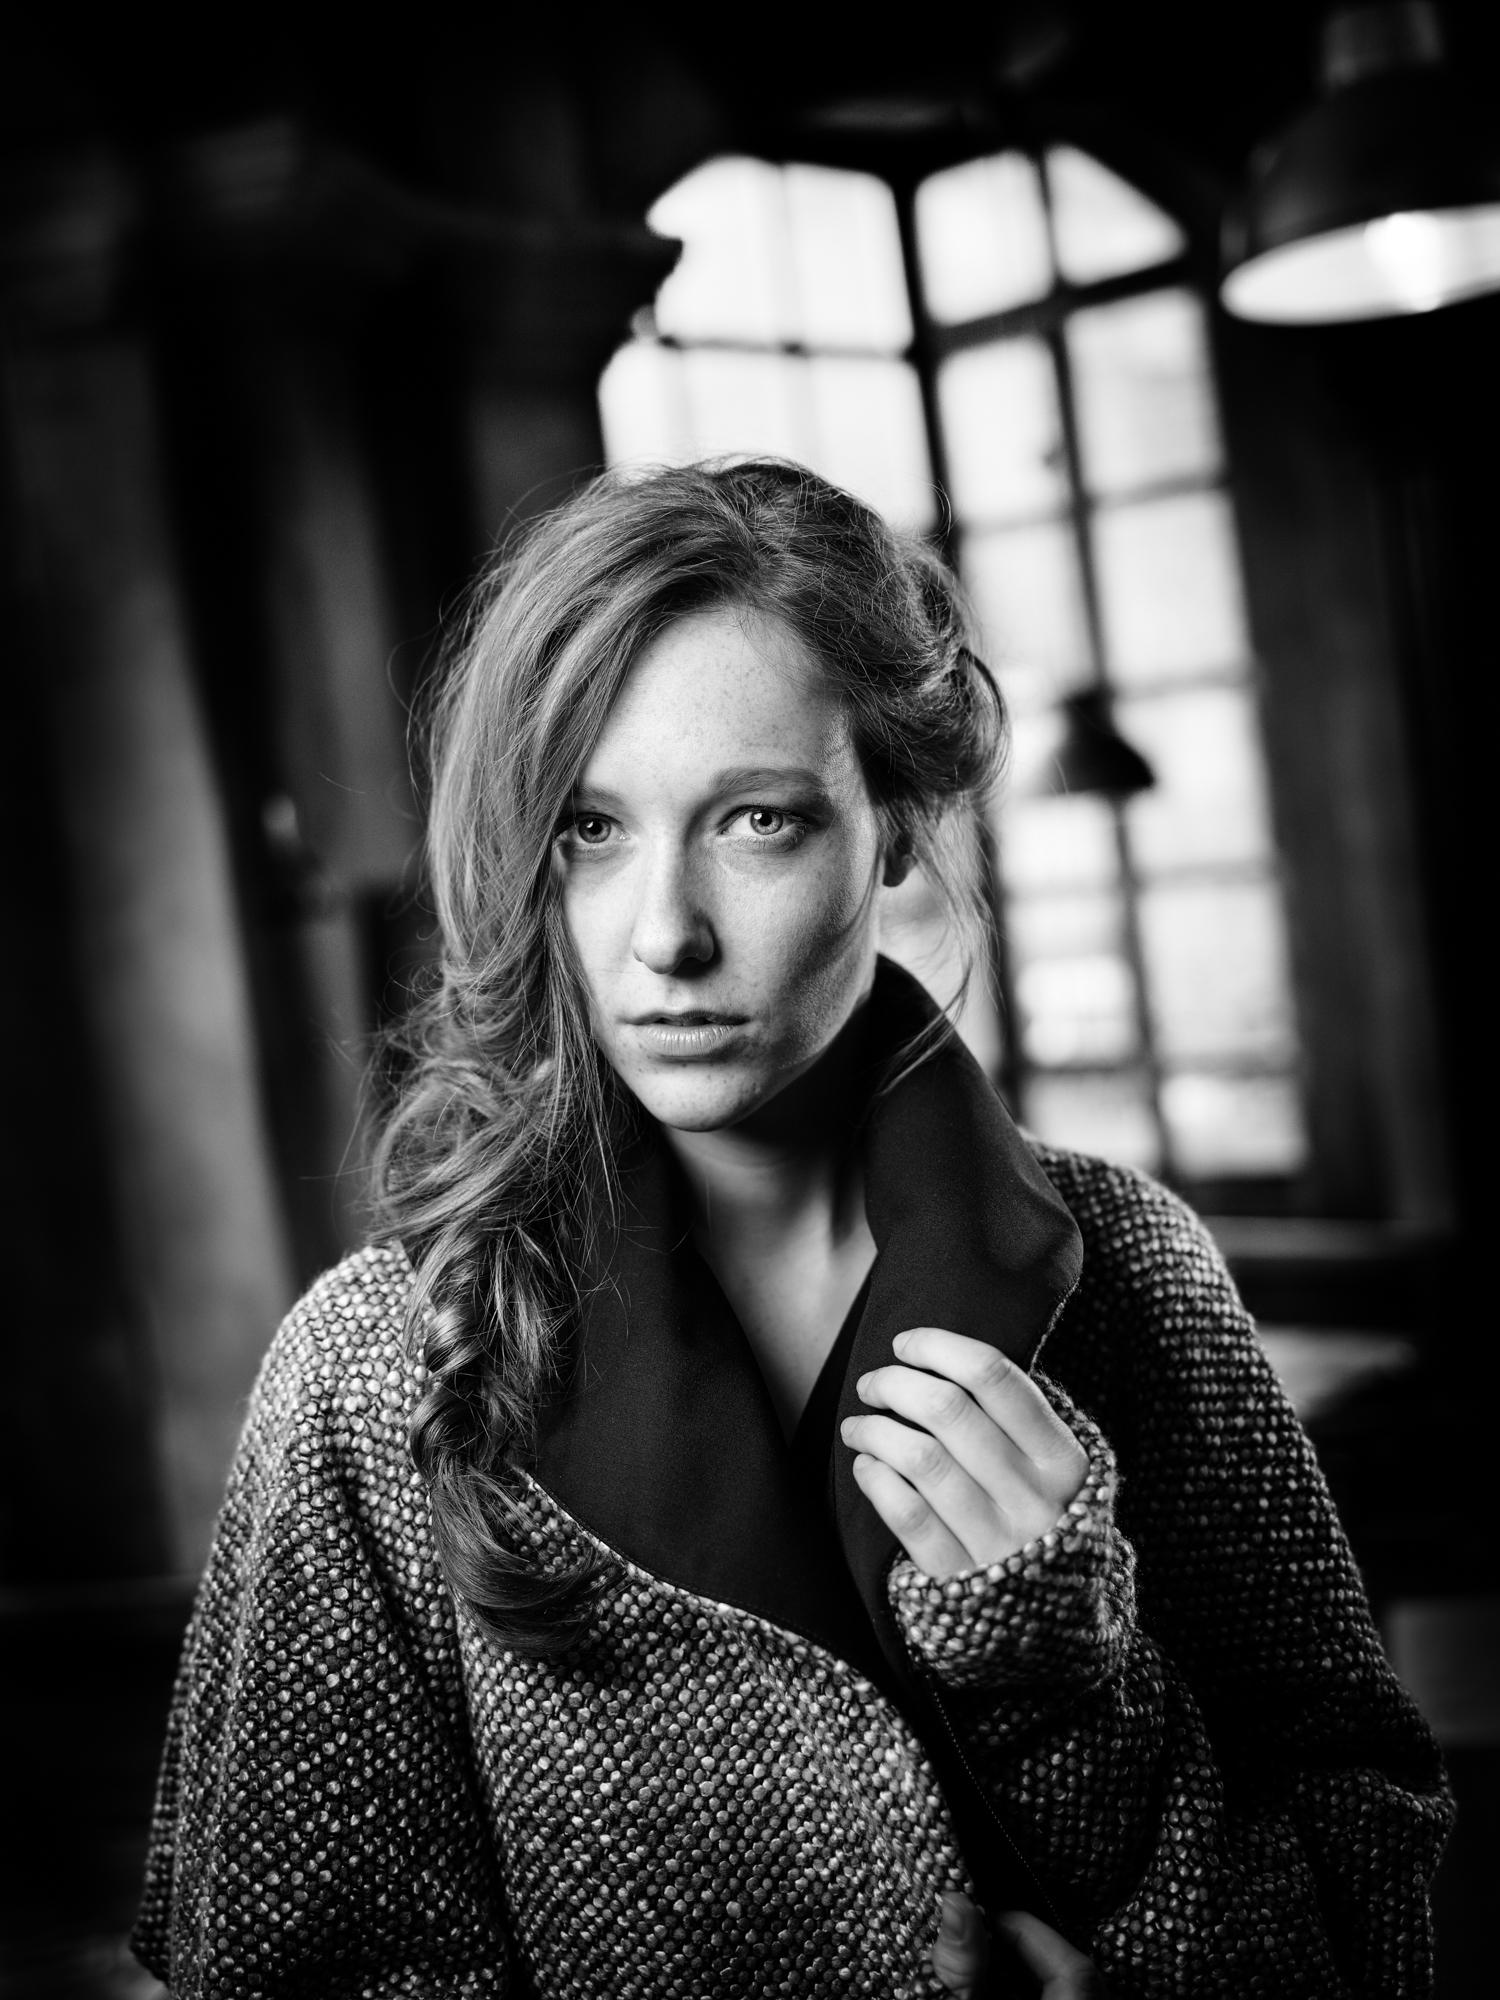 Portrait Fotografie on location, Leonie, time models, Peoplefotografie, Portraitfotografie, Zürich